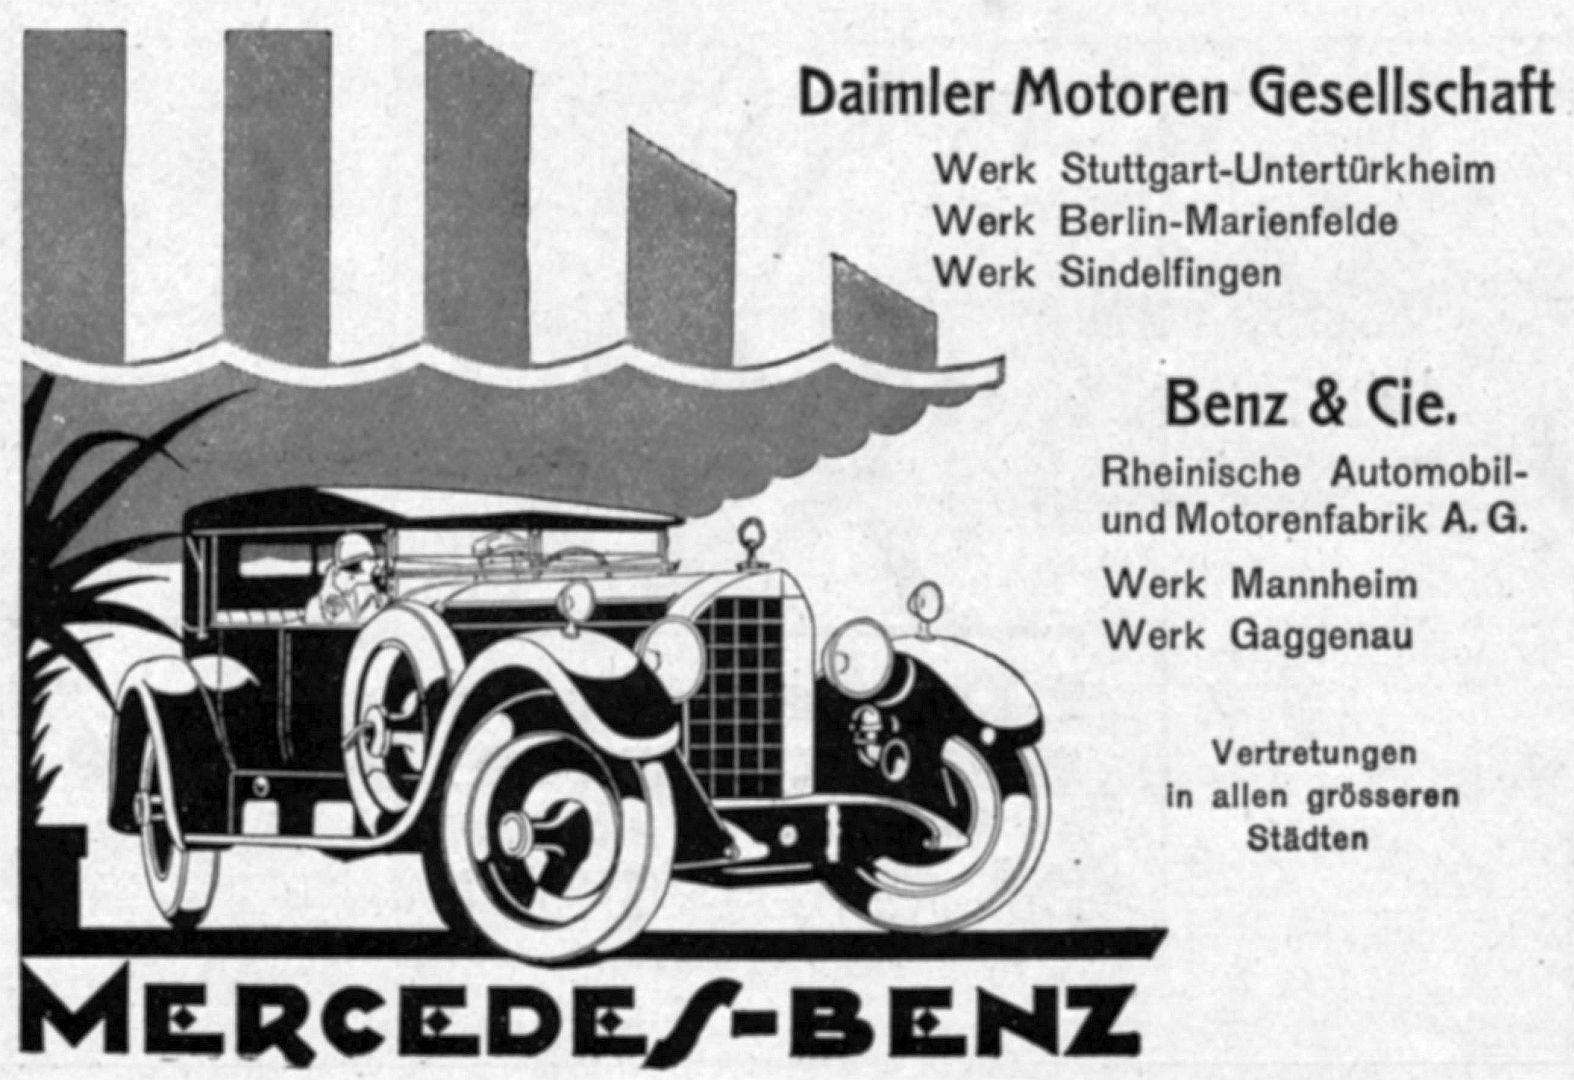 Mercedes-Benz-Reklame_ab_1925_Galerie